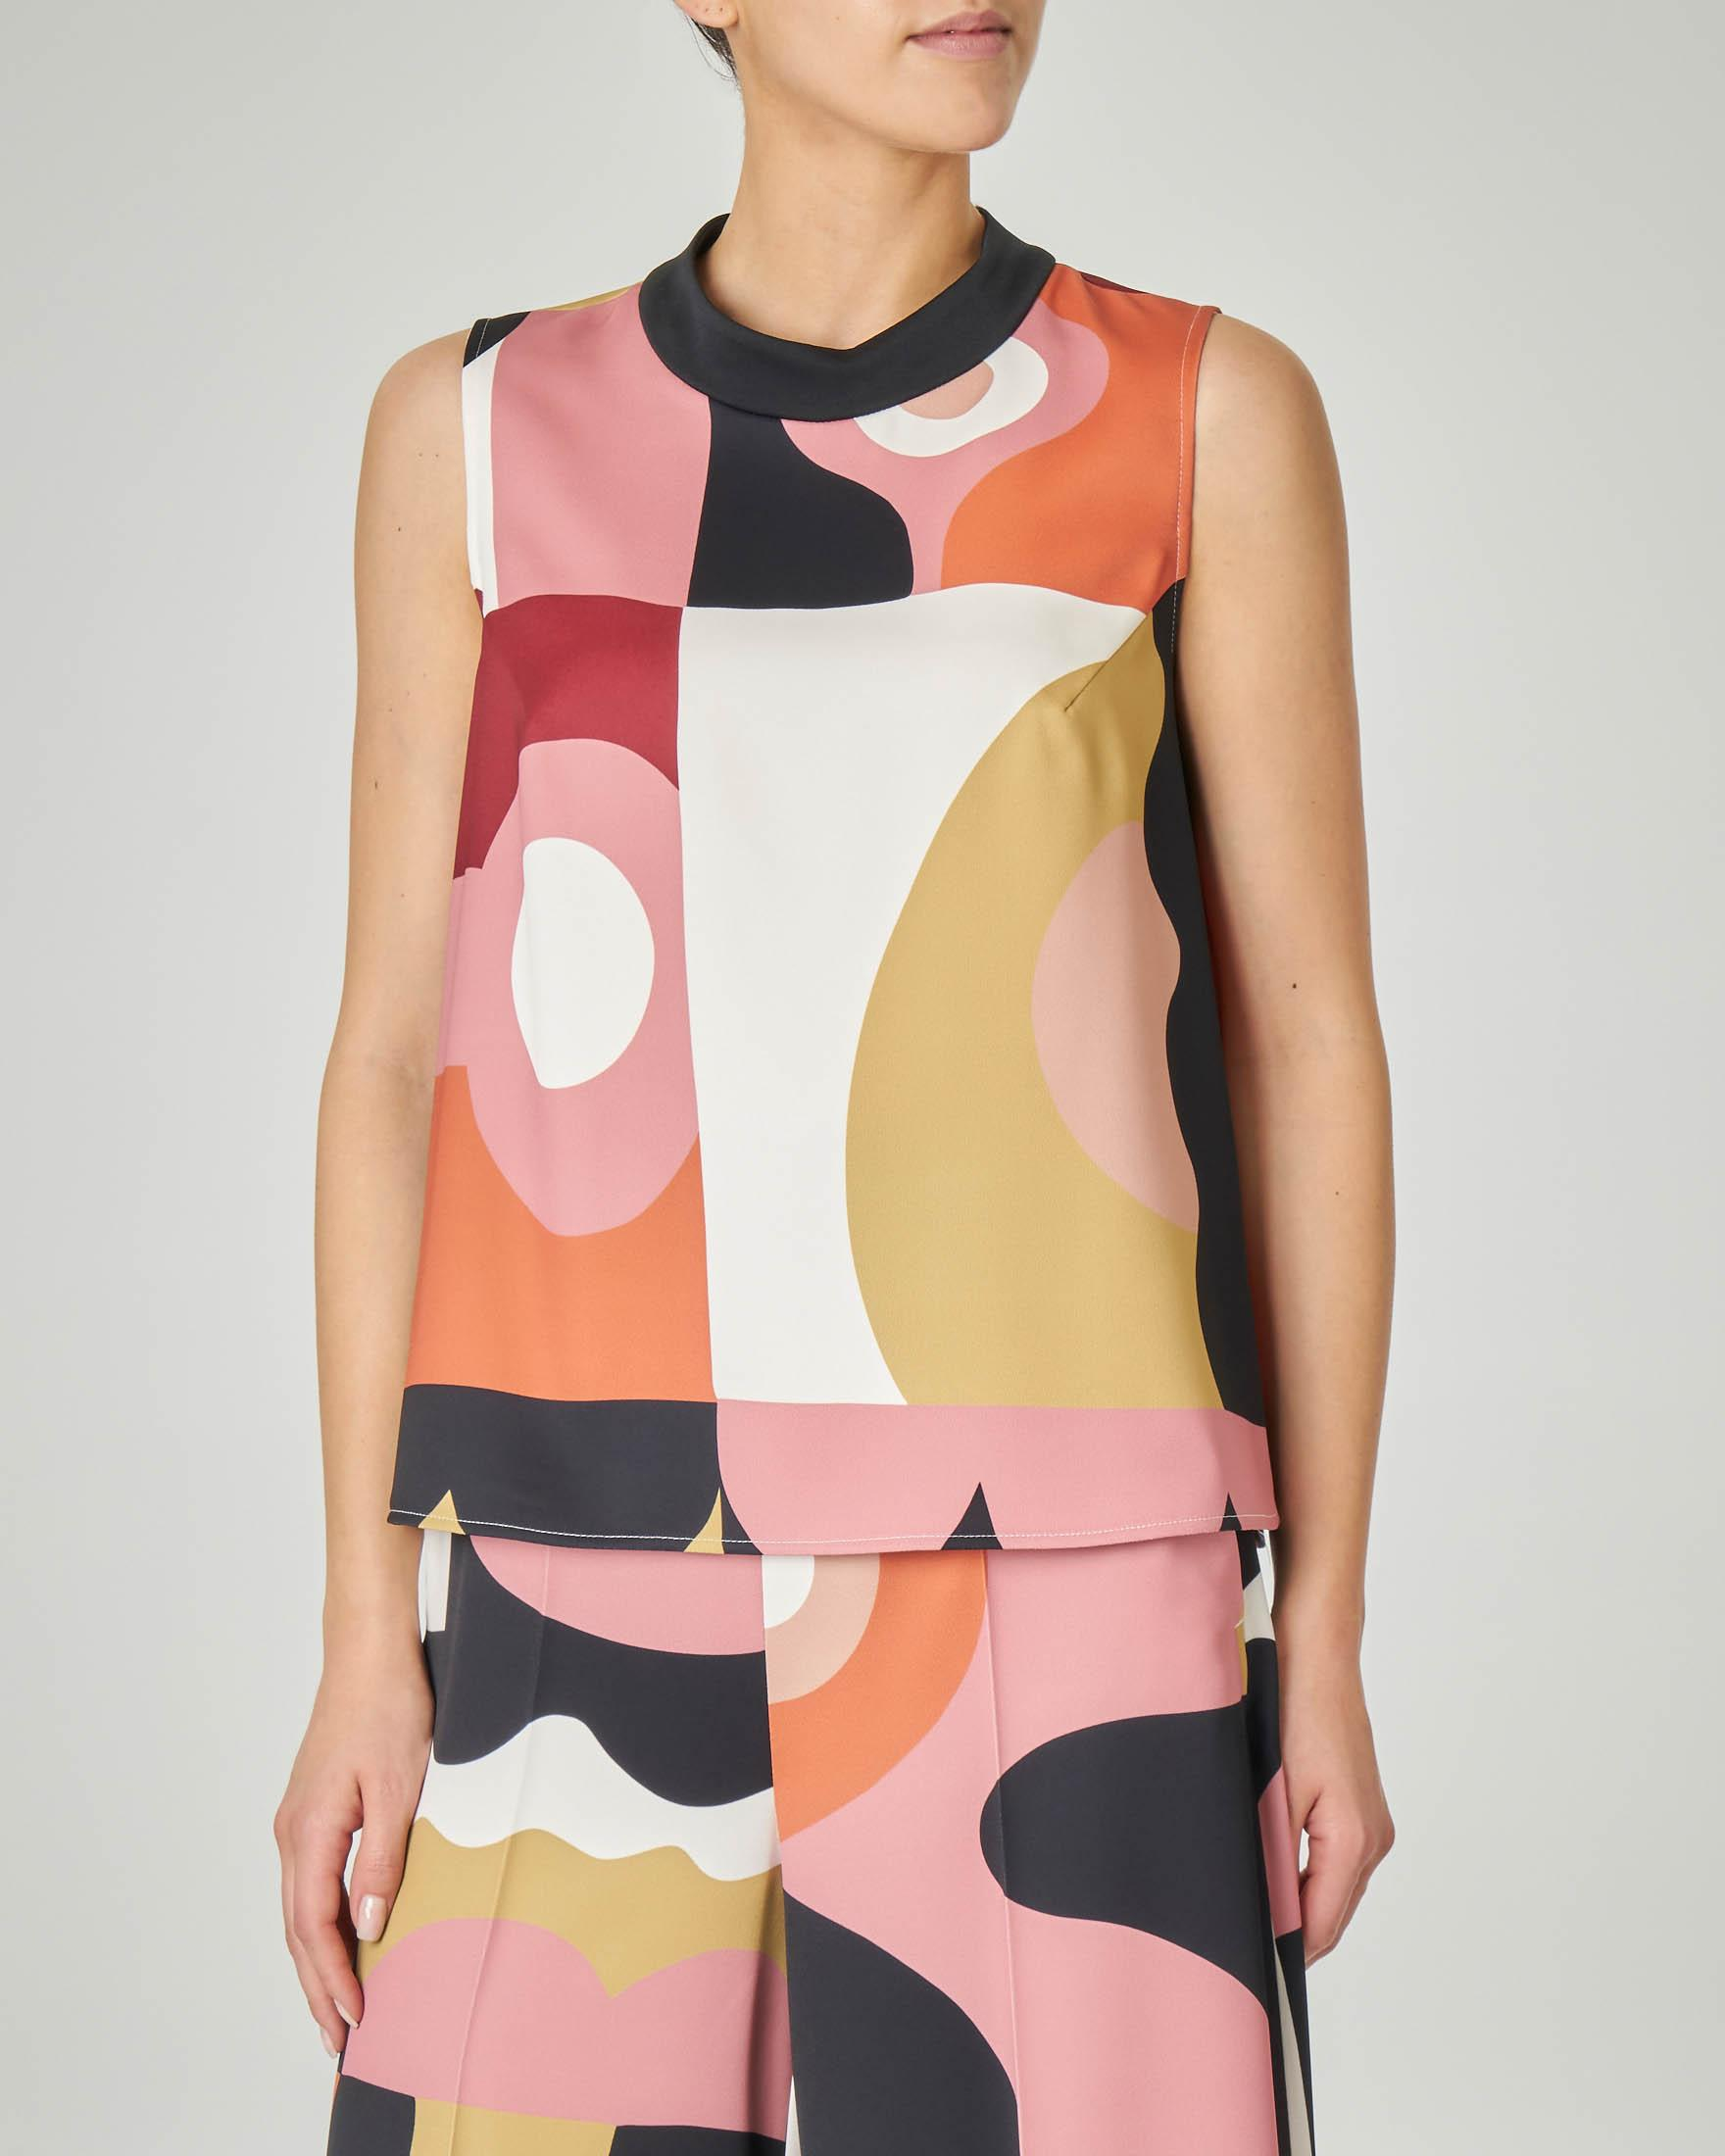 Blusa svasata LW x ART. 365 in crêpe a fantasia geometrica multicolor senza maniche